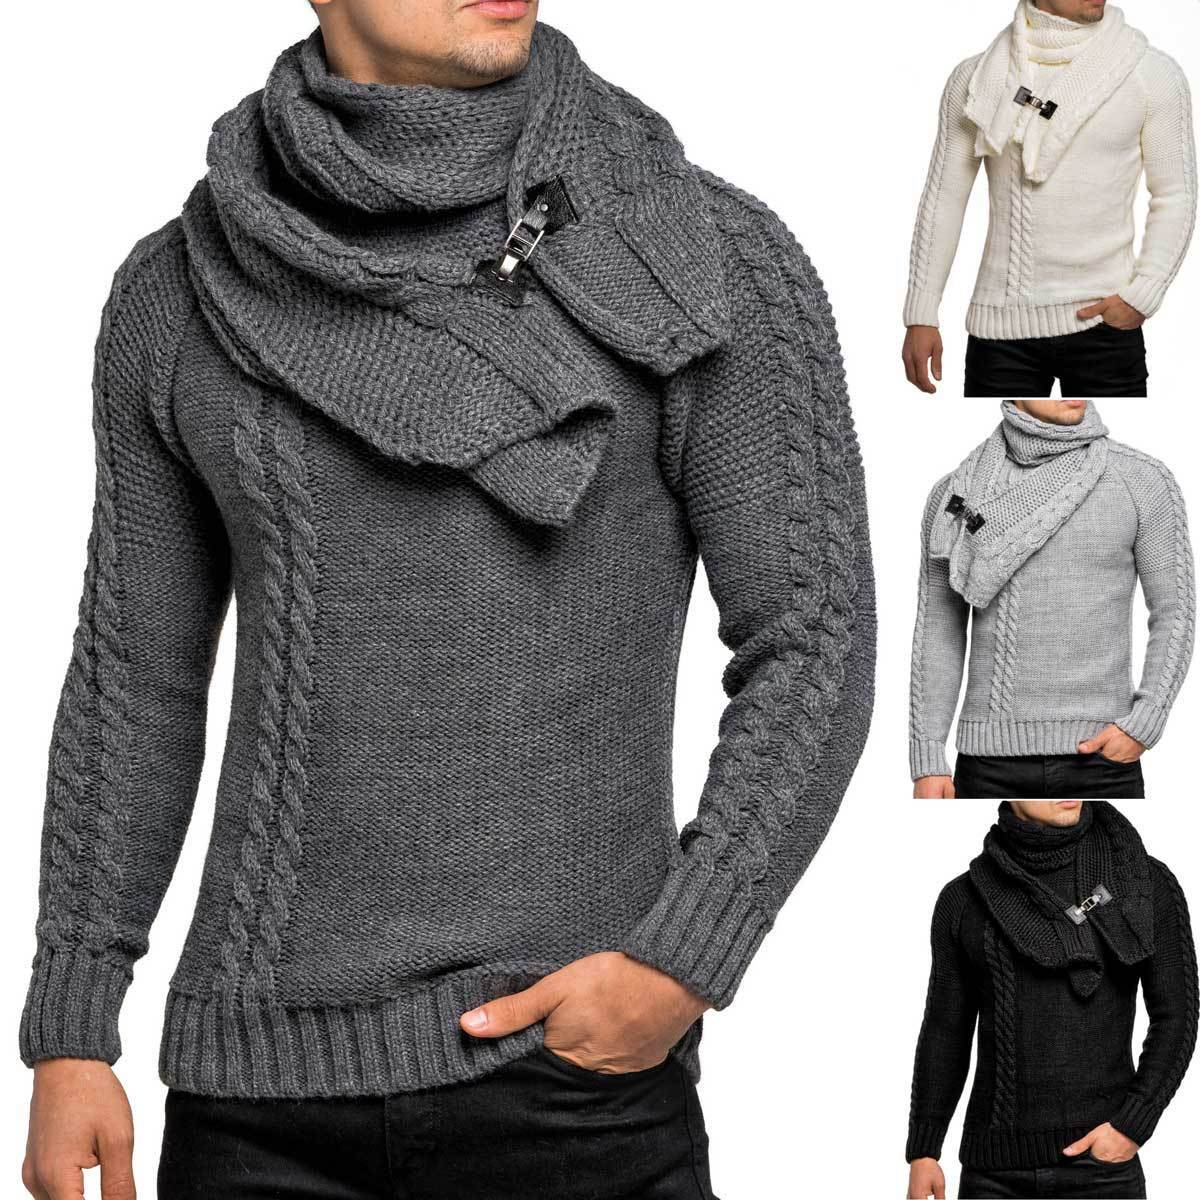 pullover herren strickpullover tazzio winter sweatshirt strick. Black Bedroom Furniture Sets. Home Design Ideas